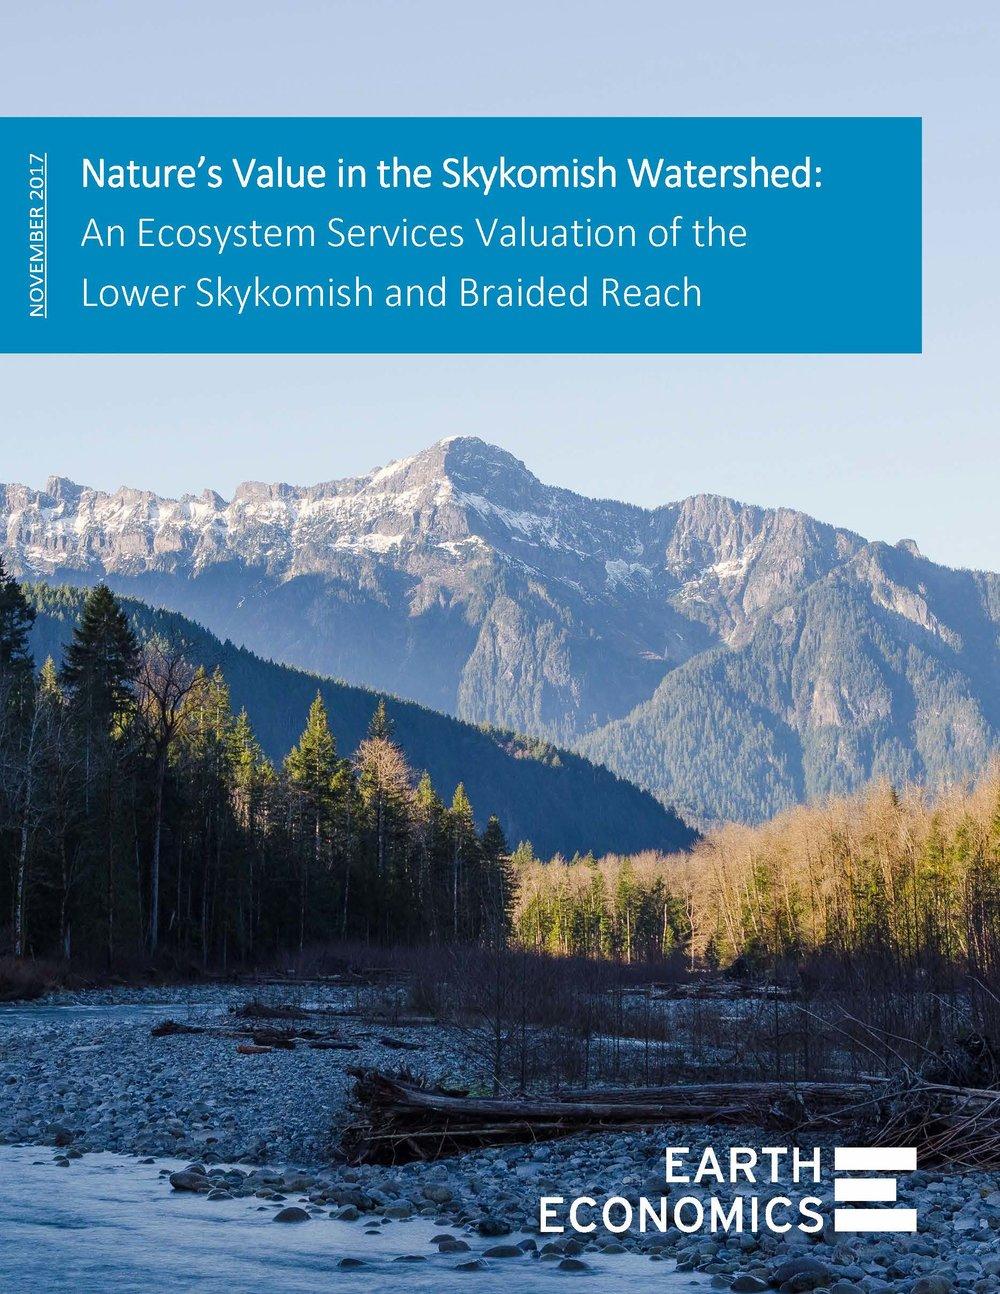 Cover_NaturesValueintheSkykomishWatershed_EarthEconomics_Nov2017.jpg